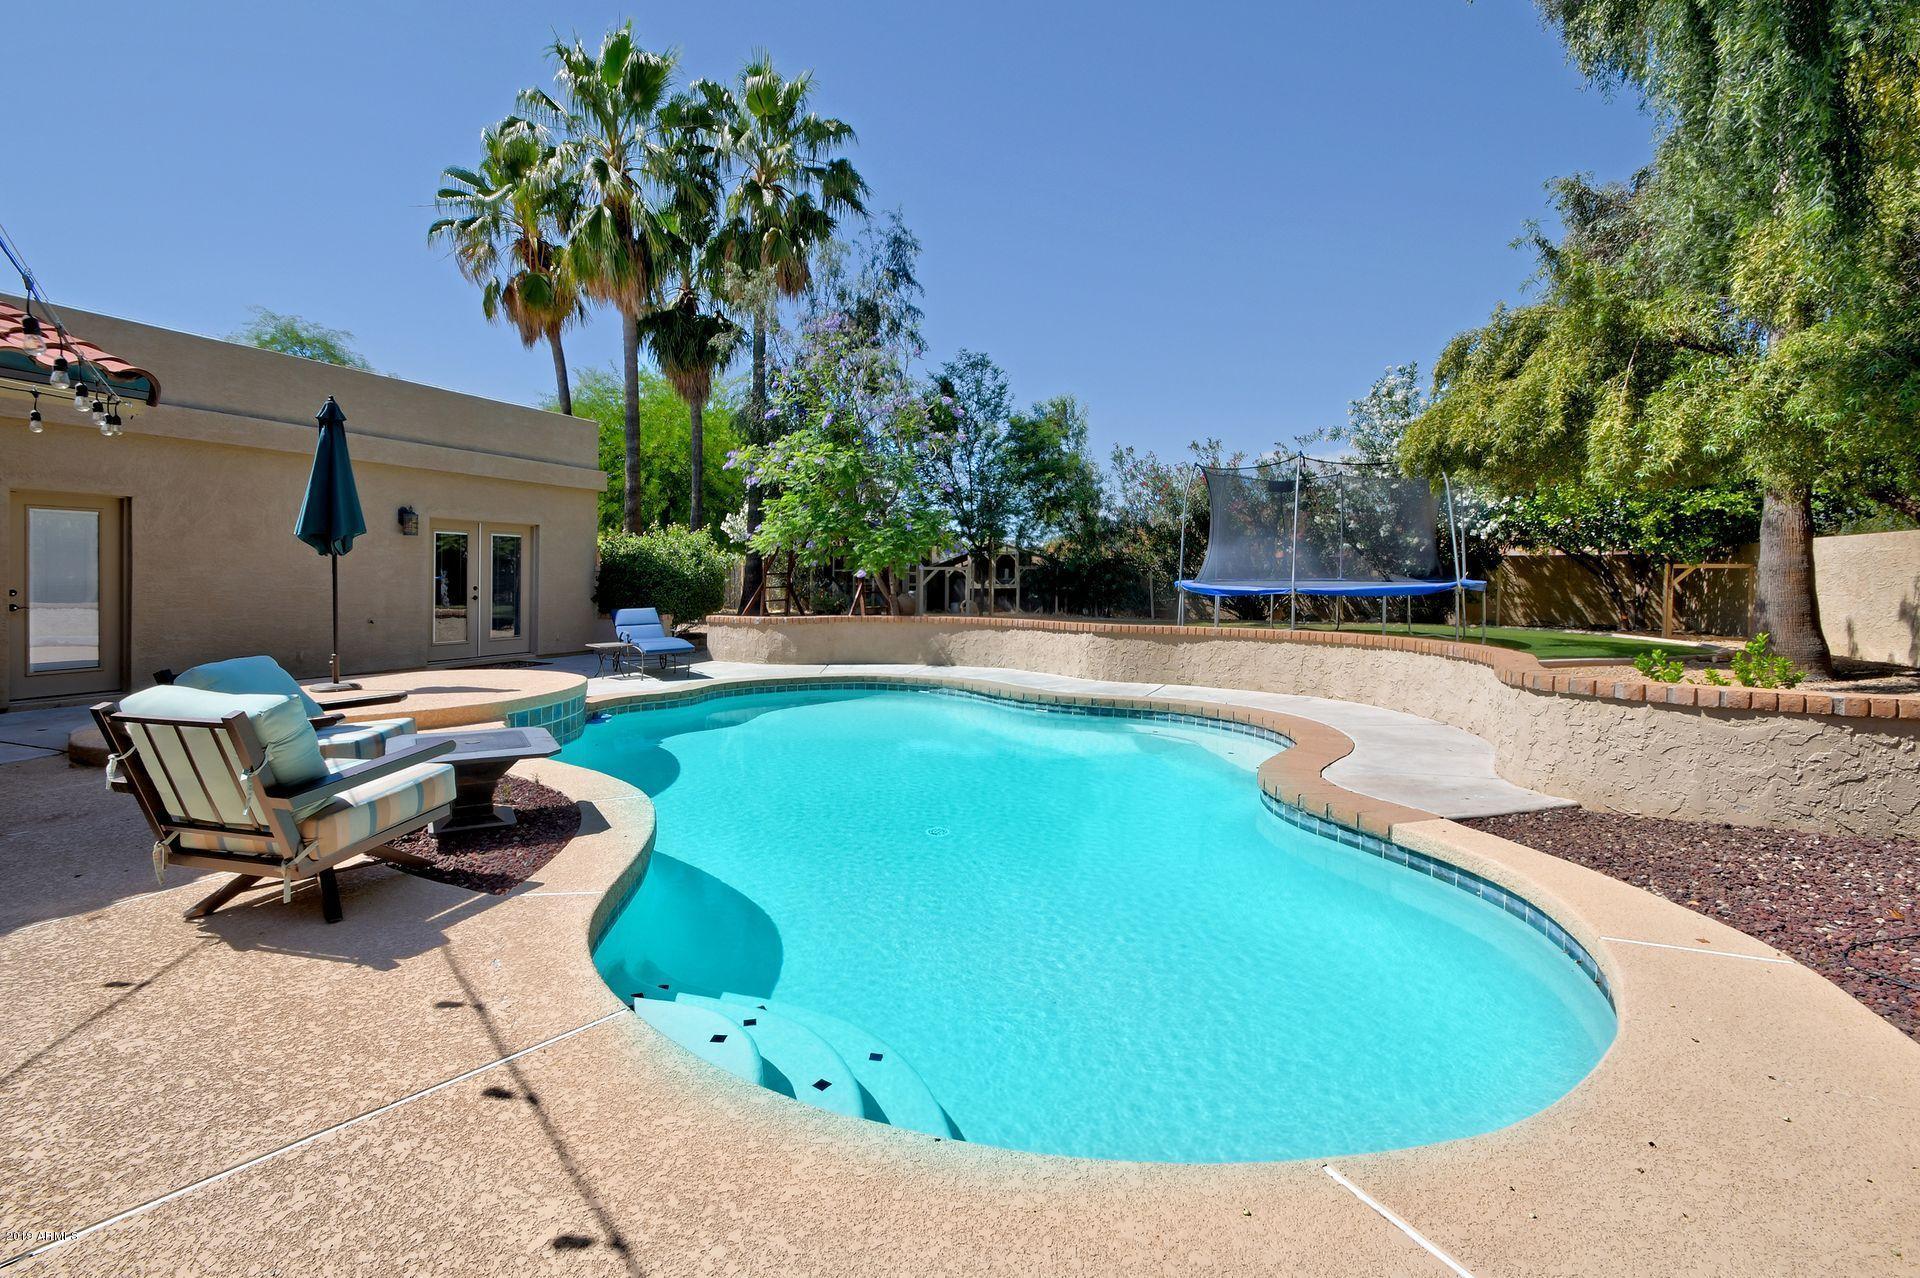 MLS 5925374 7408 E CORRINE Road, Scottsdale, AZ 85260 Scottsdale AZ Guest House